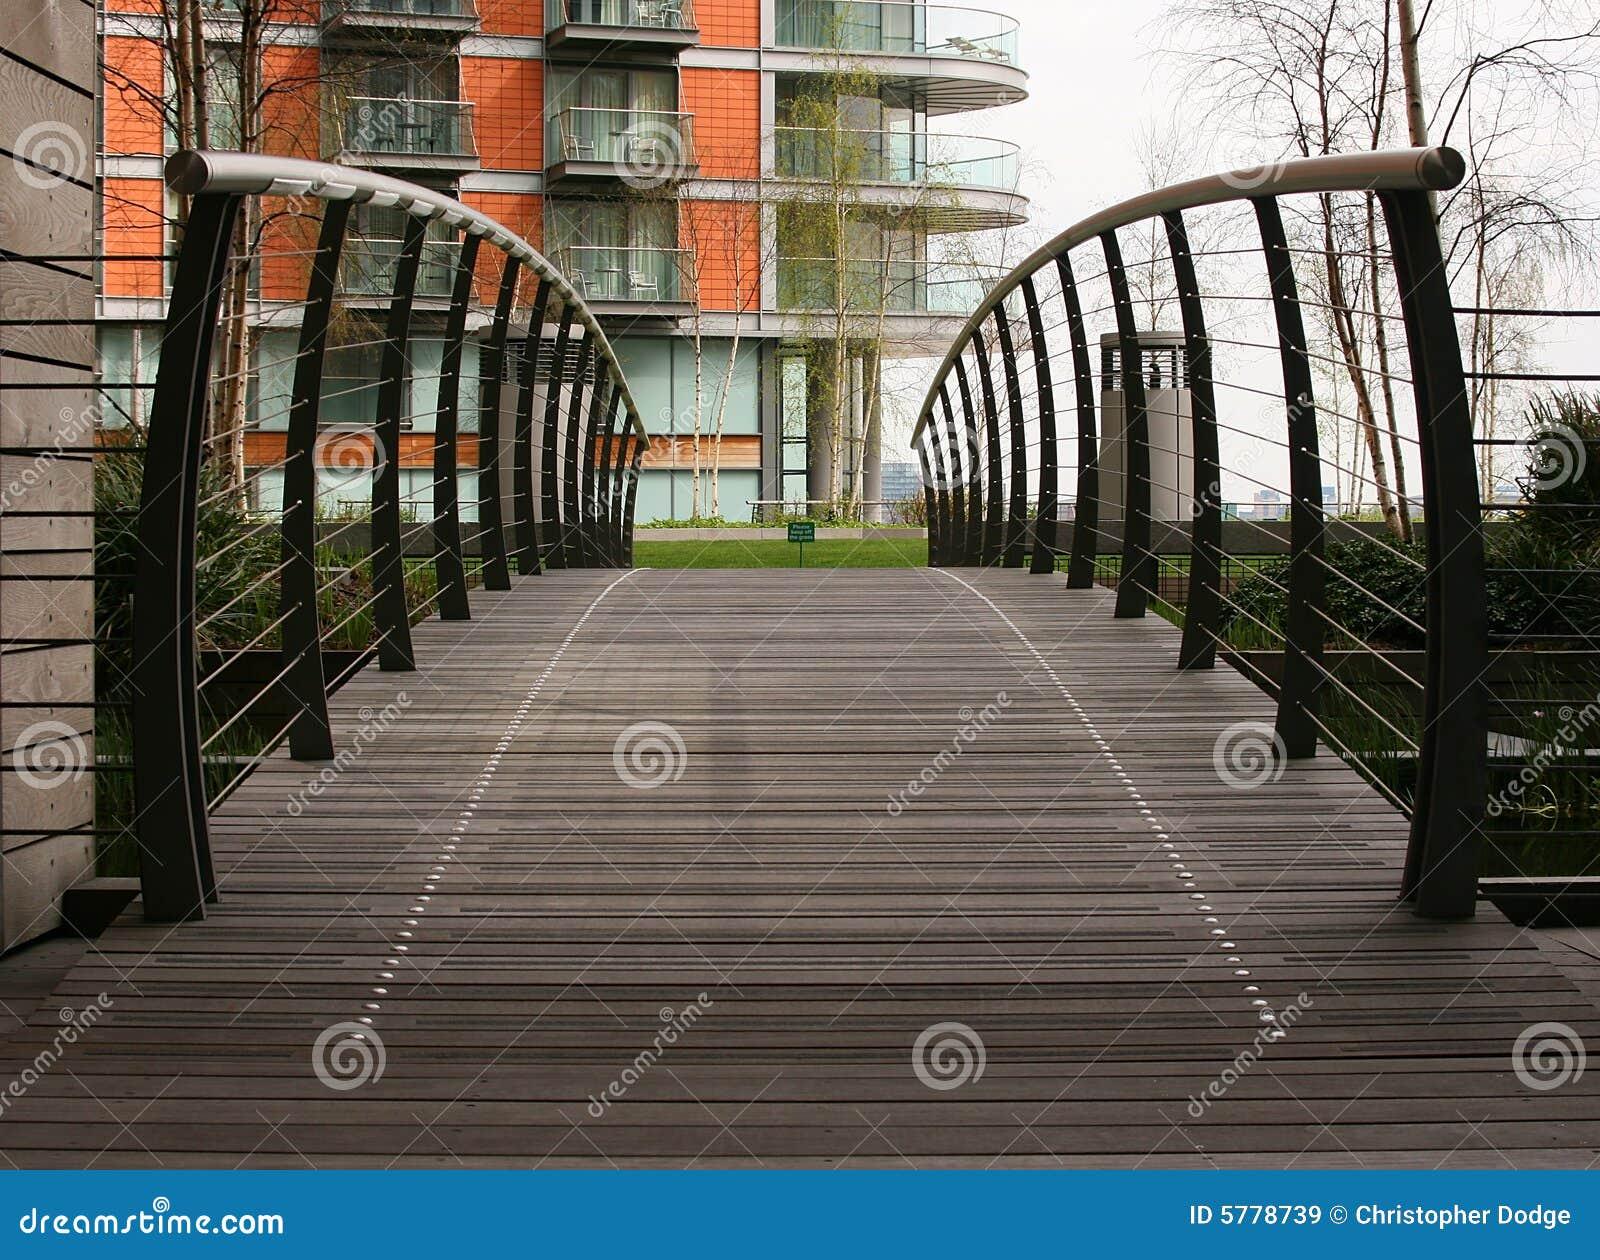 Bridge to apartments